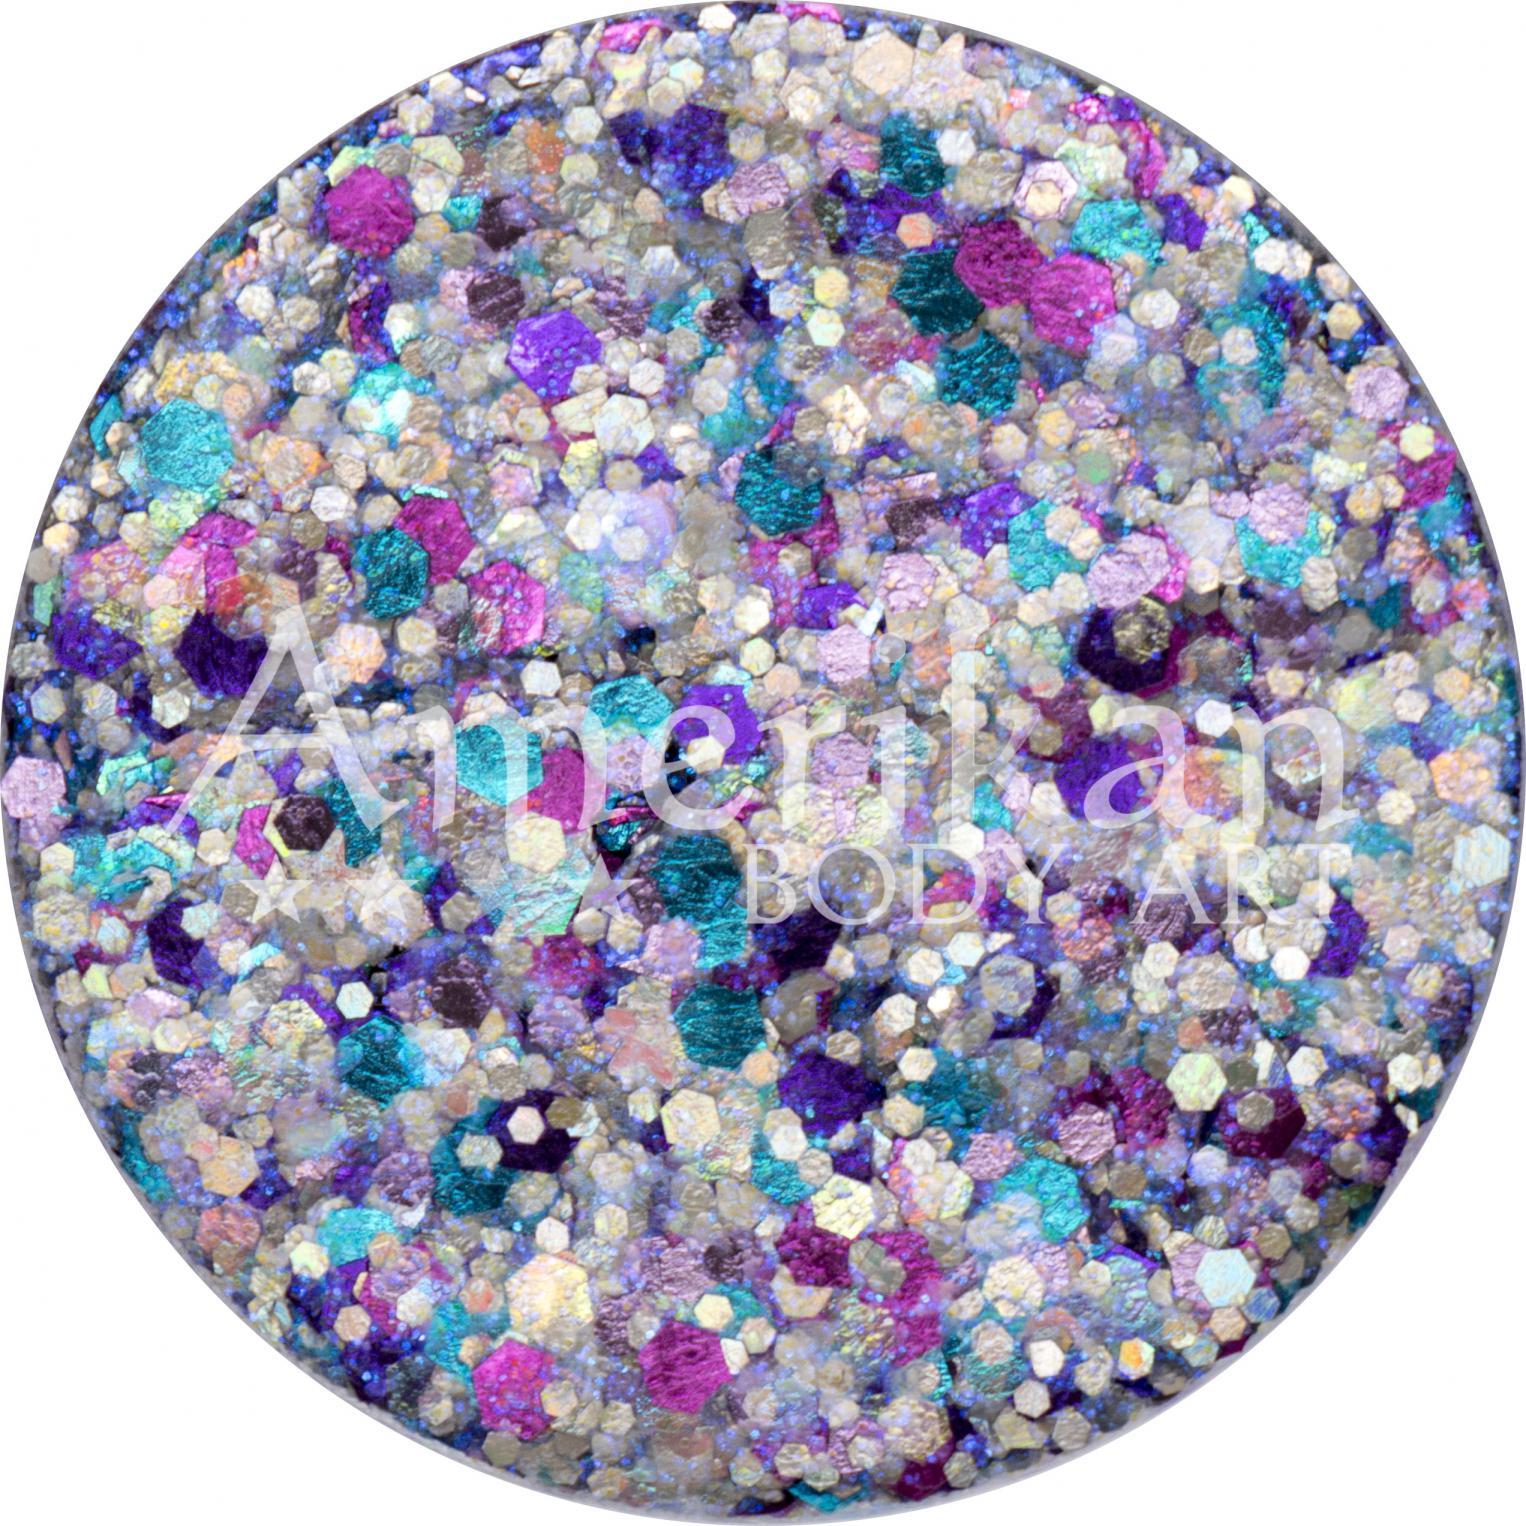 Galaxy Glitter Creme